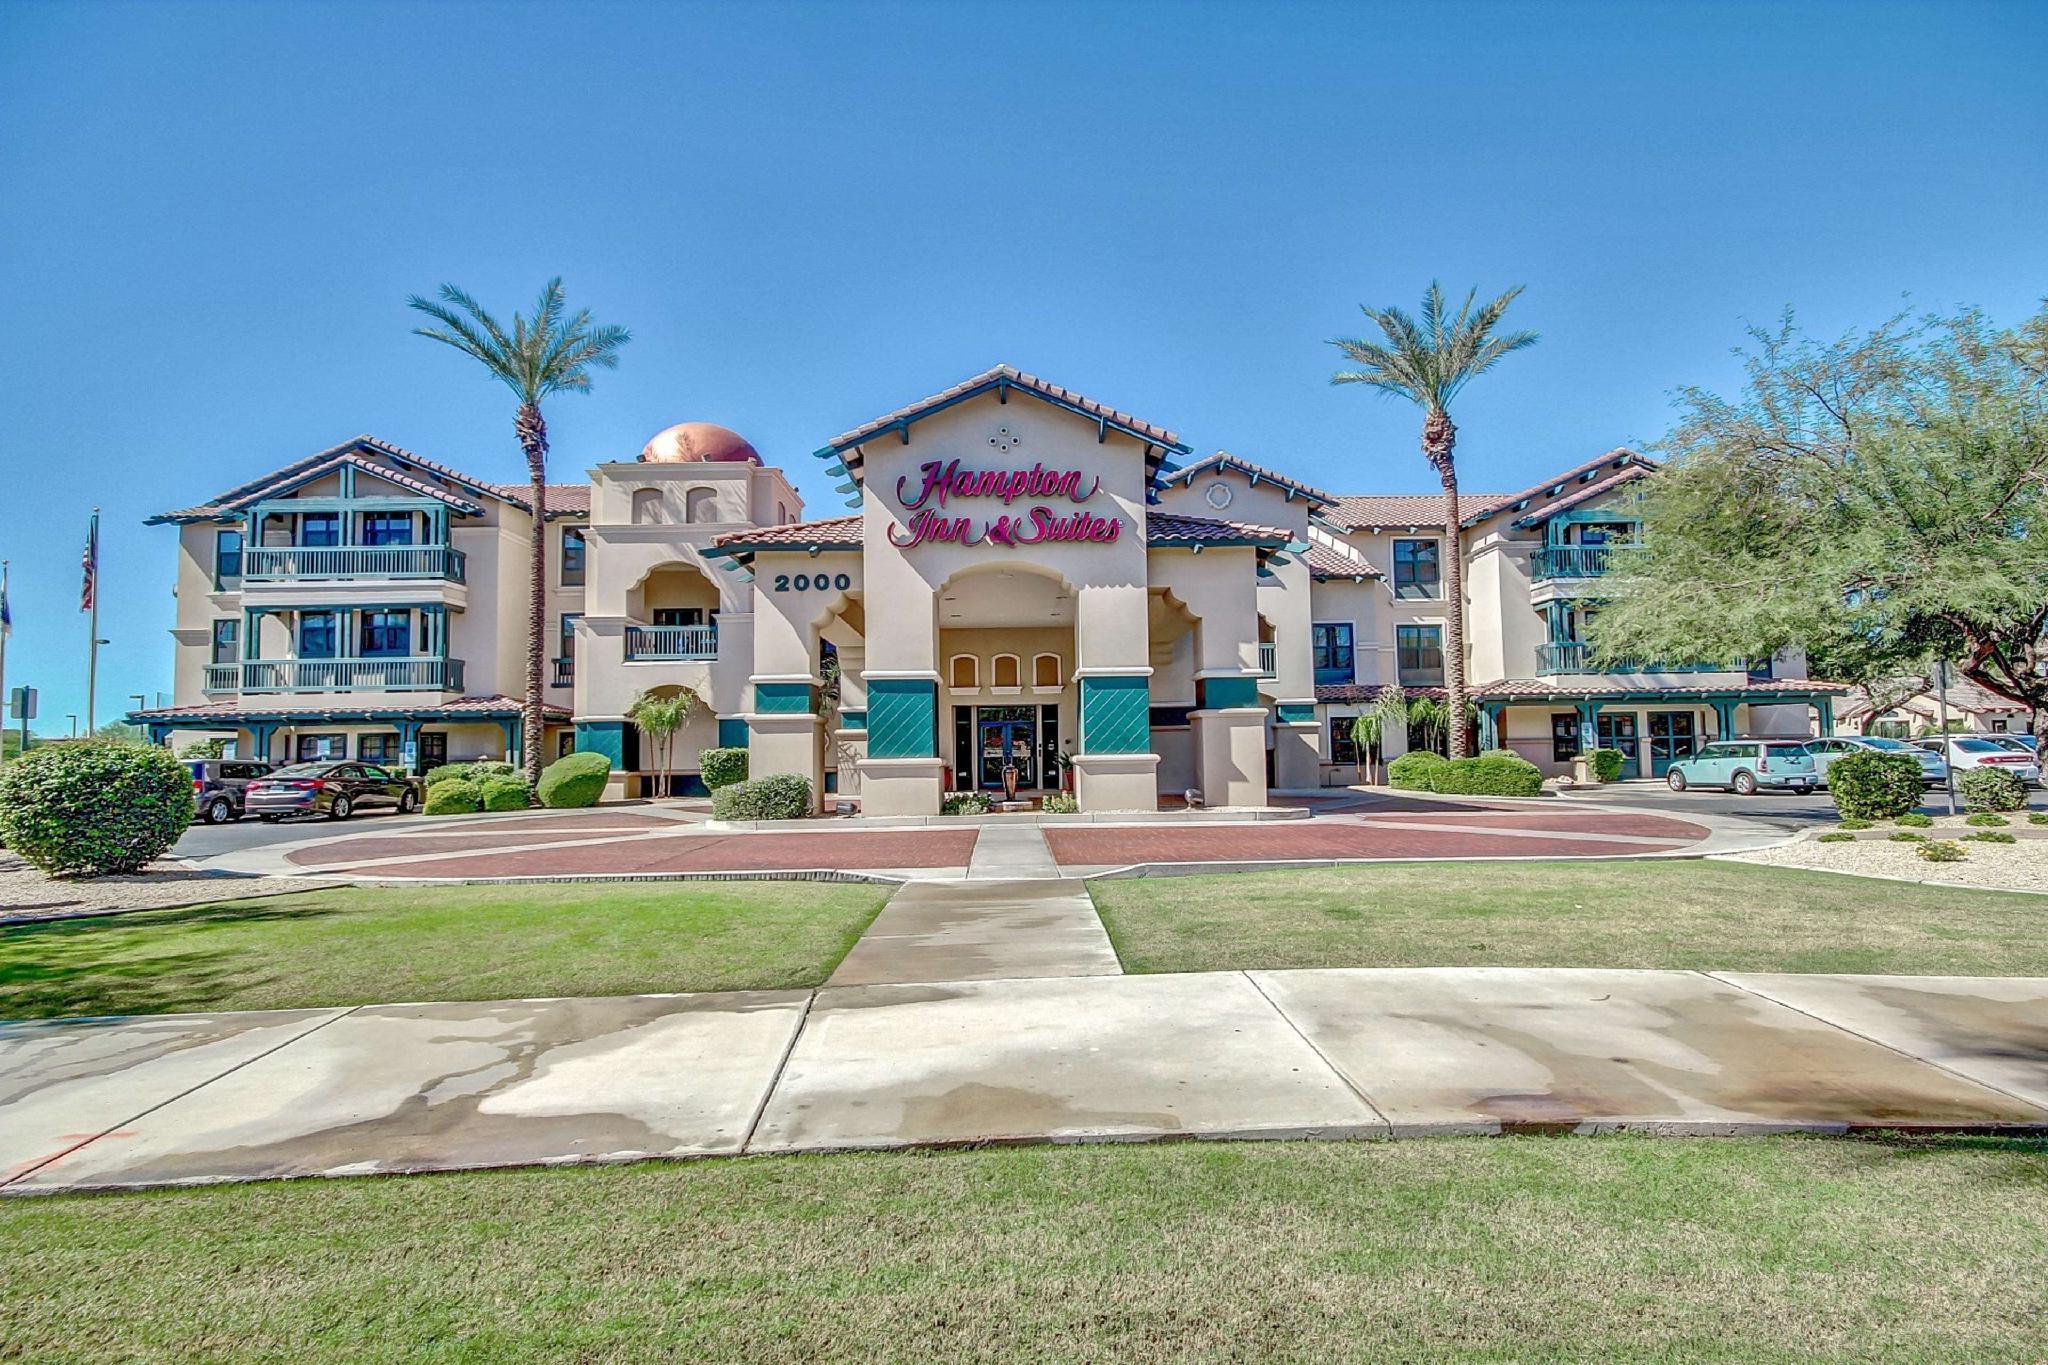 Hampton Inn And Suites Goodyear